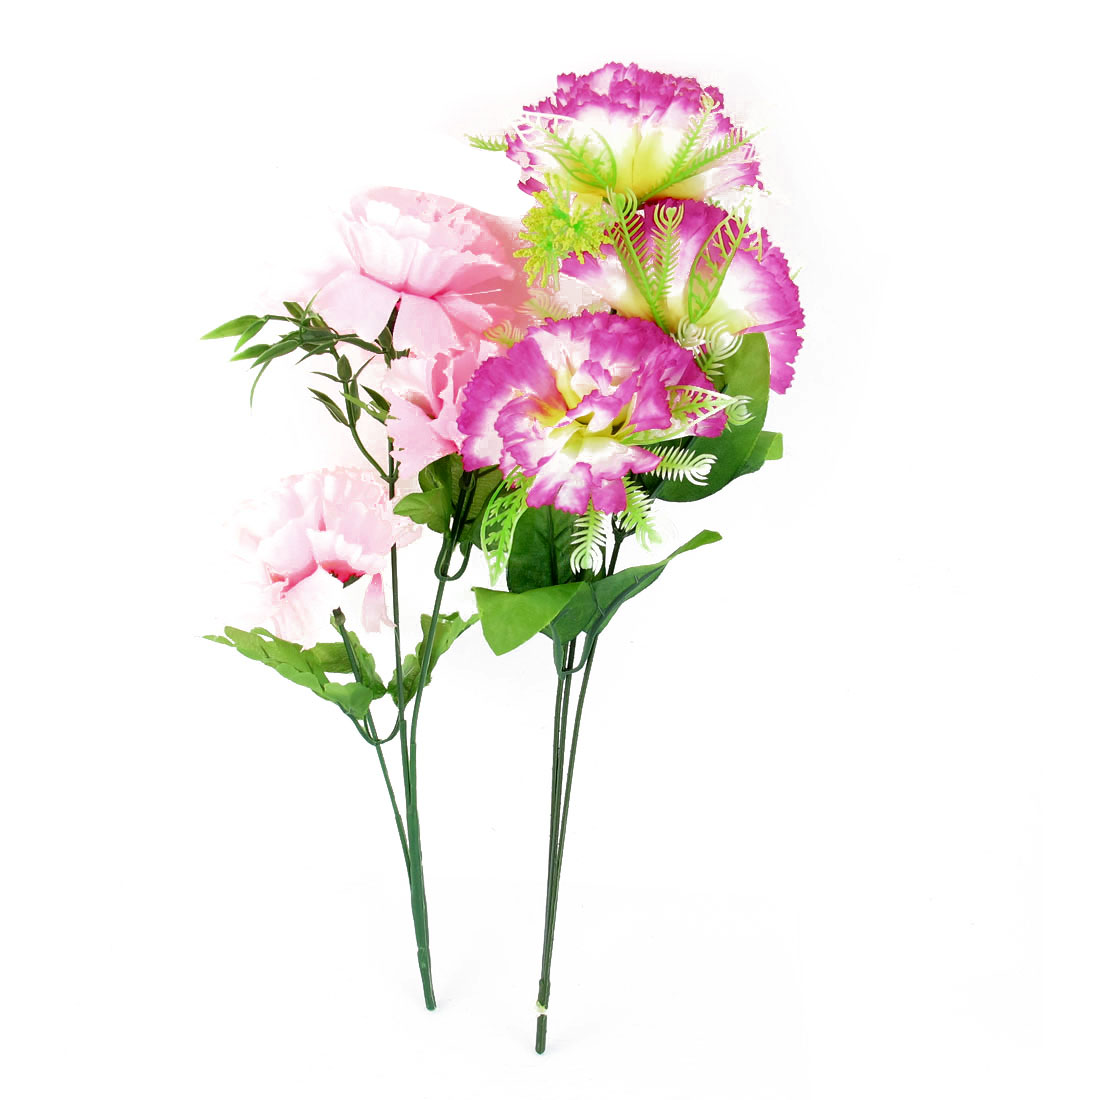 2 Pcs Wedding Party Artificial Fabric Fuchsia Pink Flower Bouquet 37cm Height